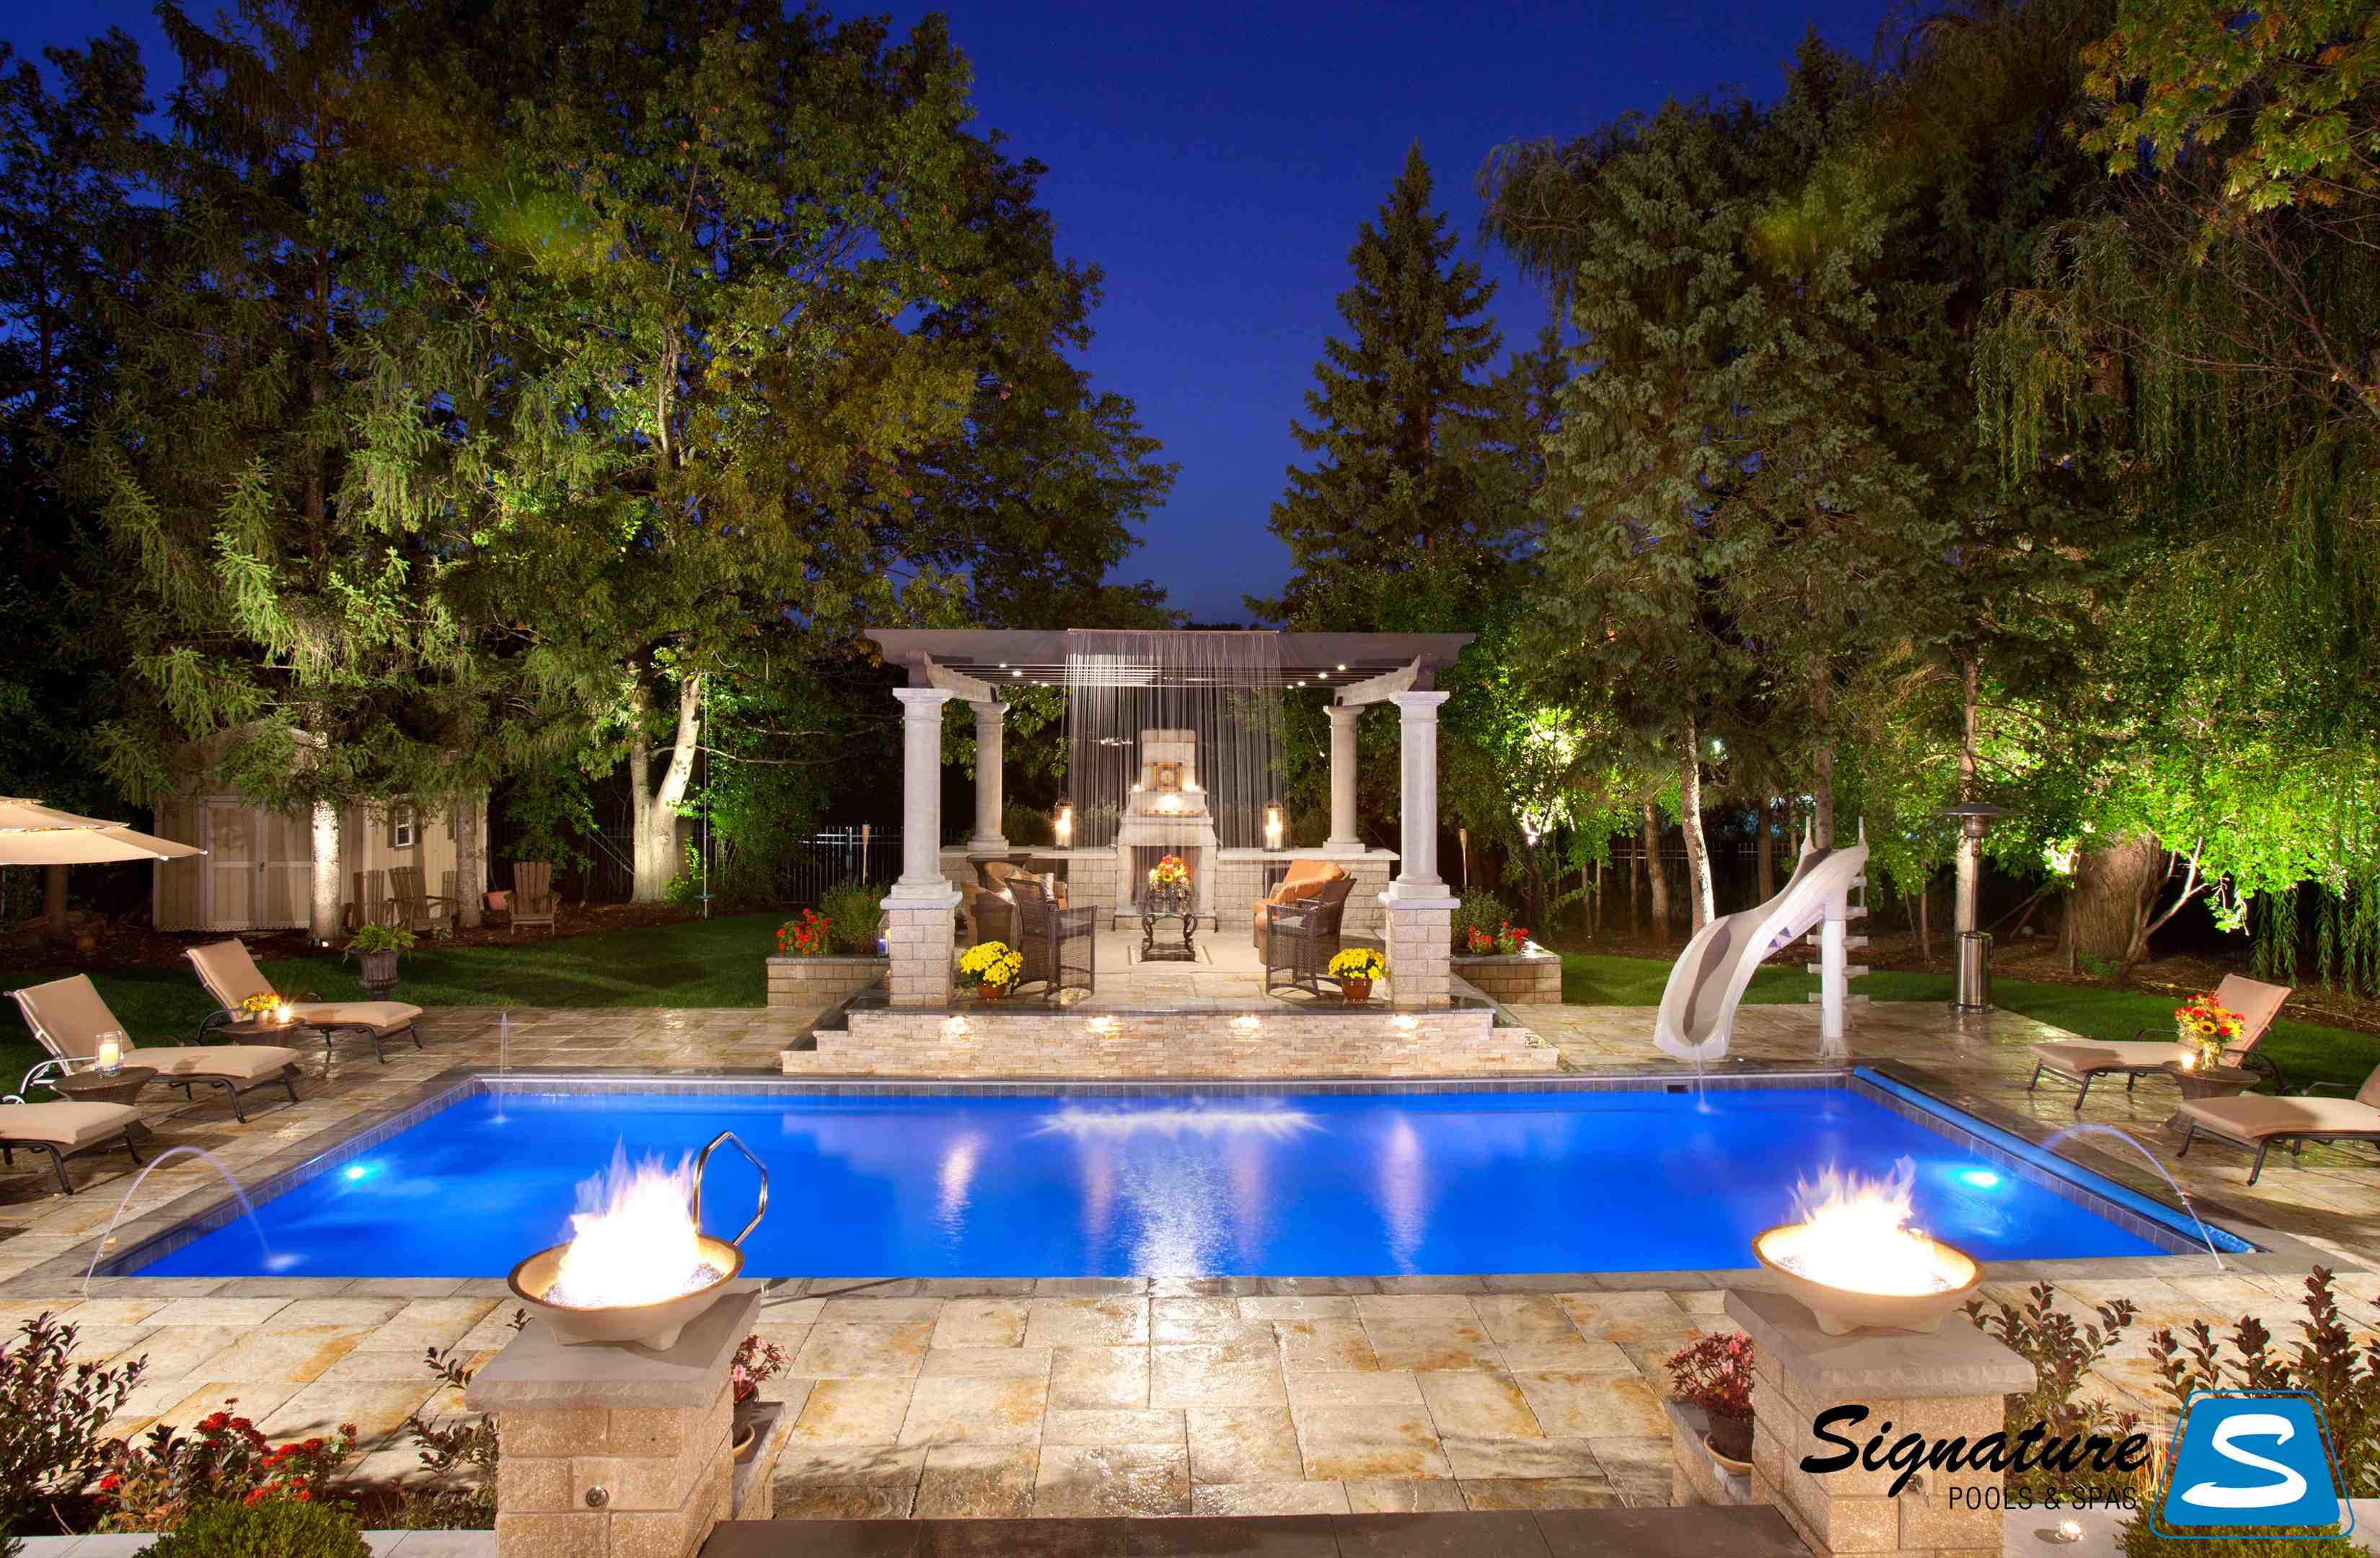 Ten Tips for Selling Luxury Backyards | Patio & Hearth Blog on Luxury Backyard Design id=63227